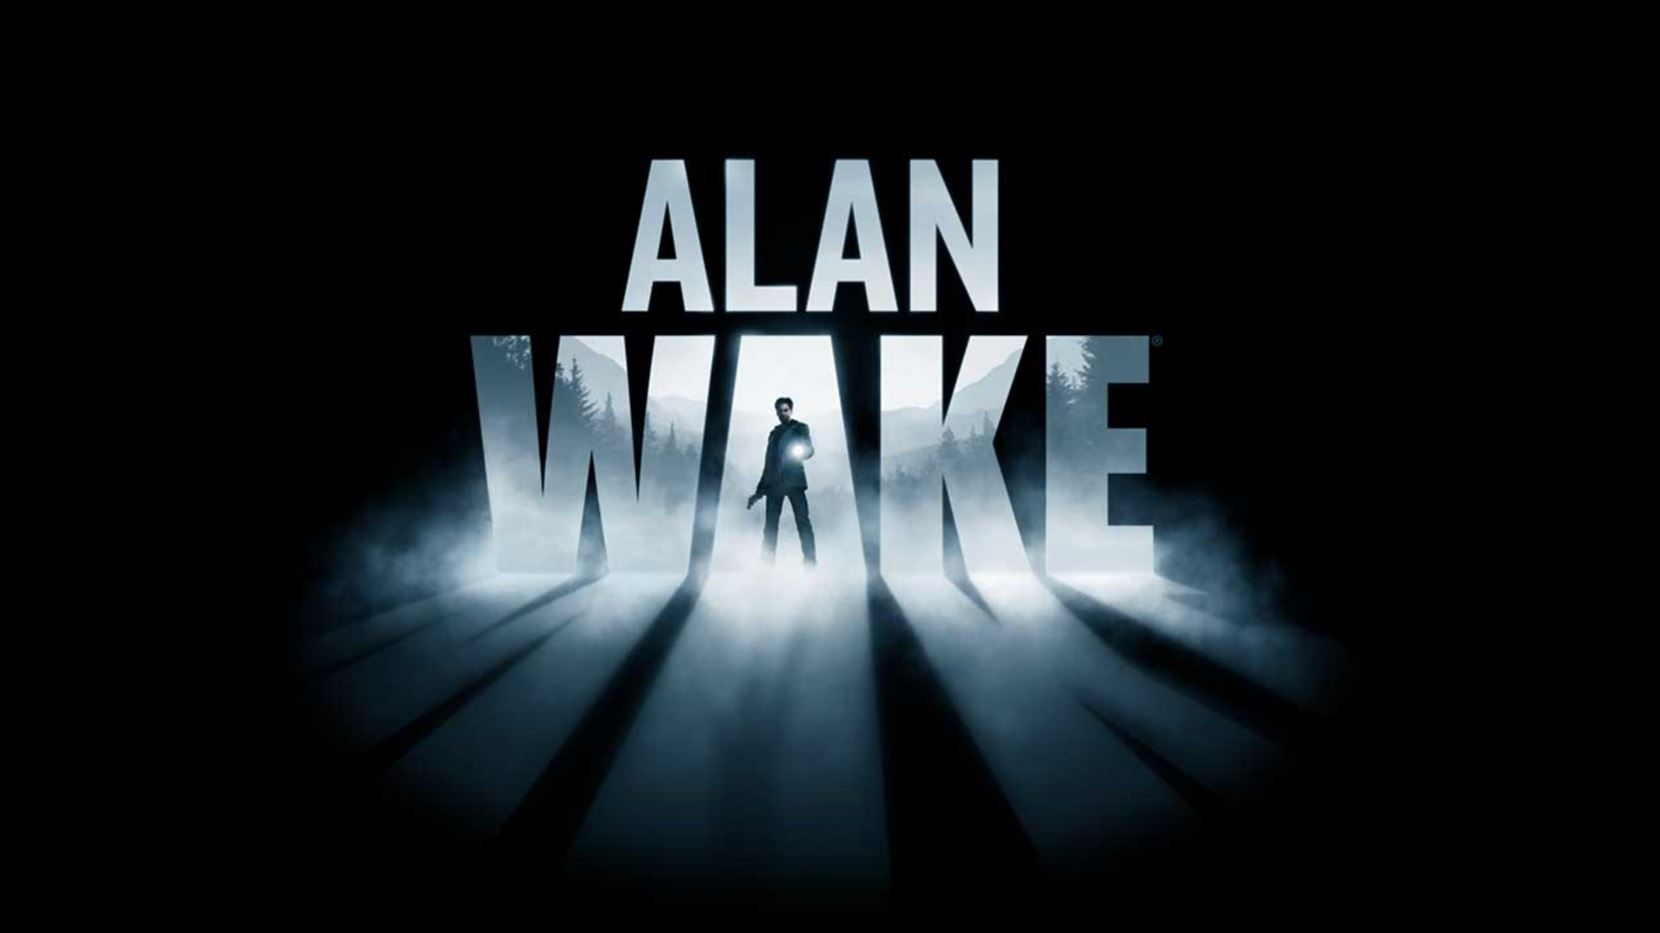 alan-wake-remastered-ps5-ps4-news-reviews-videos